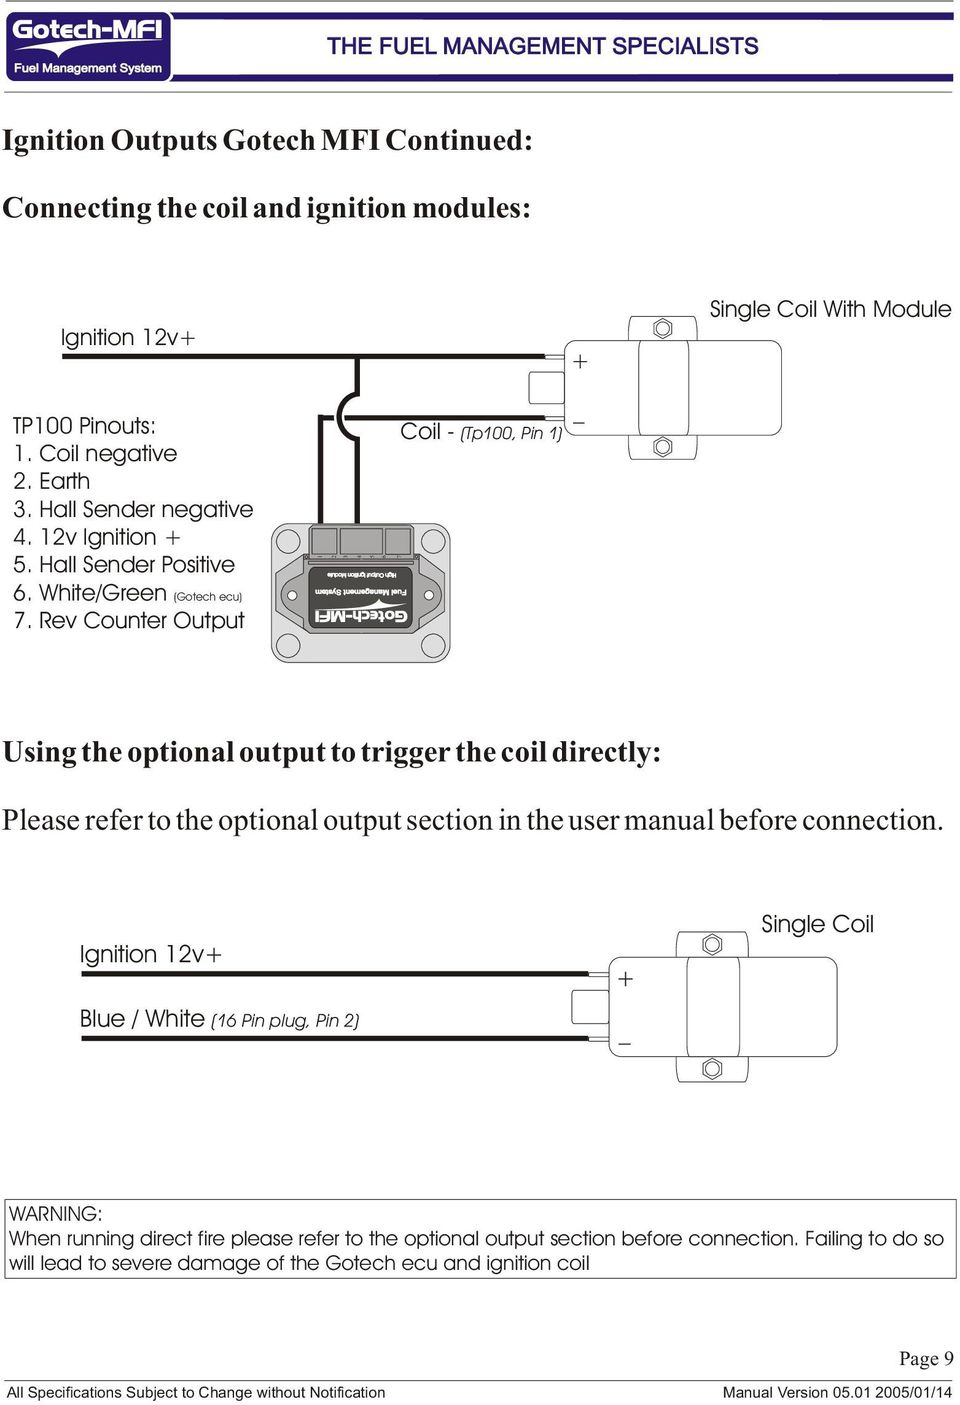 mk1 golf ignition wiring diagram 2005 ford explorer cd player starter motor best library agg ecu home for 1987 toyota cressida engine on vw